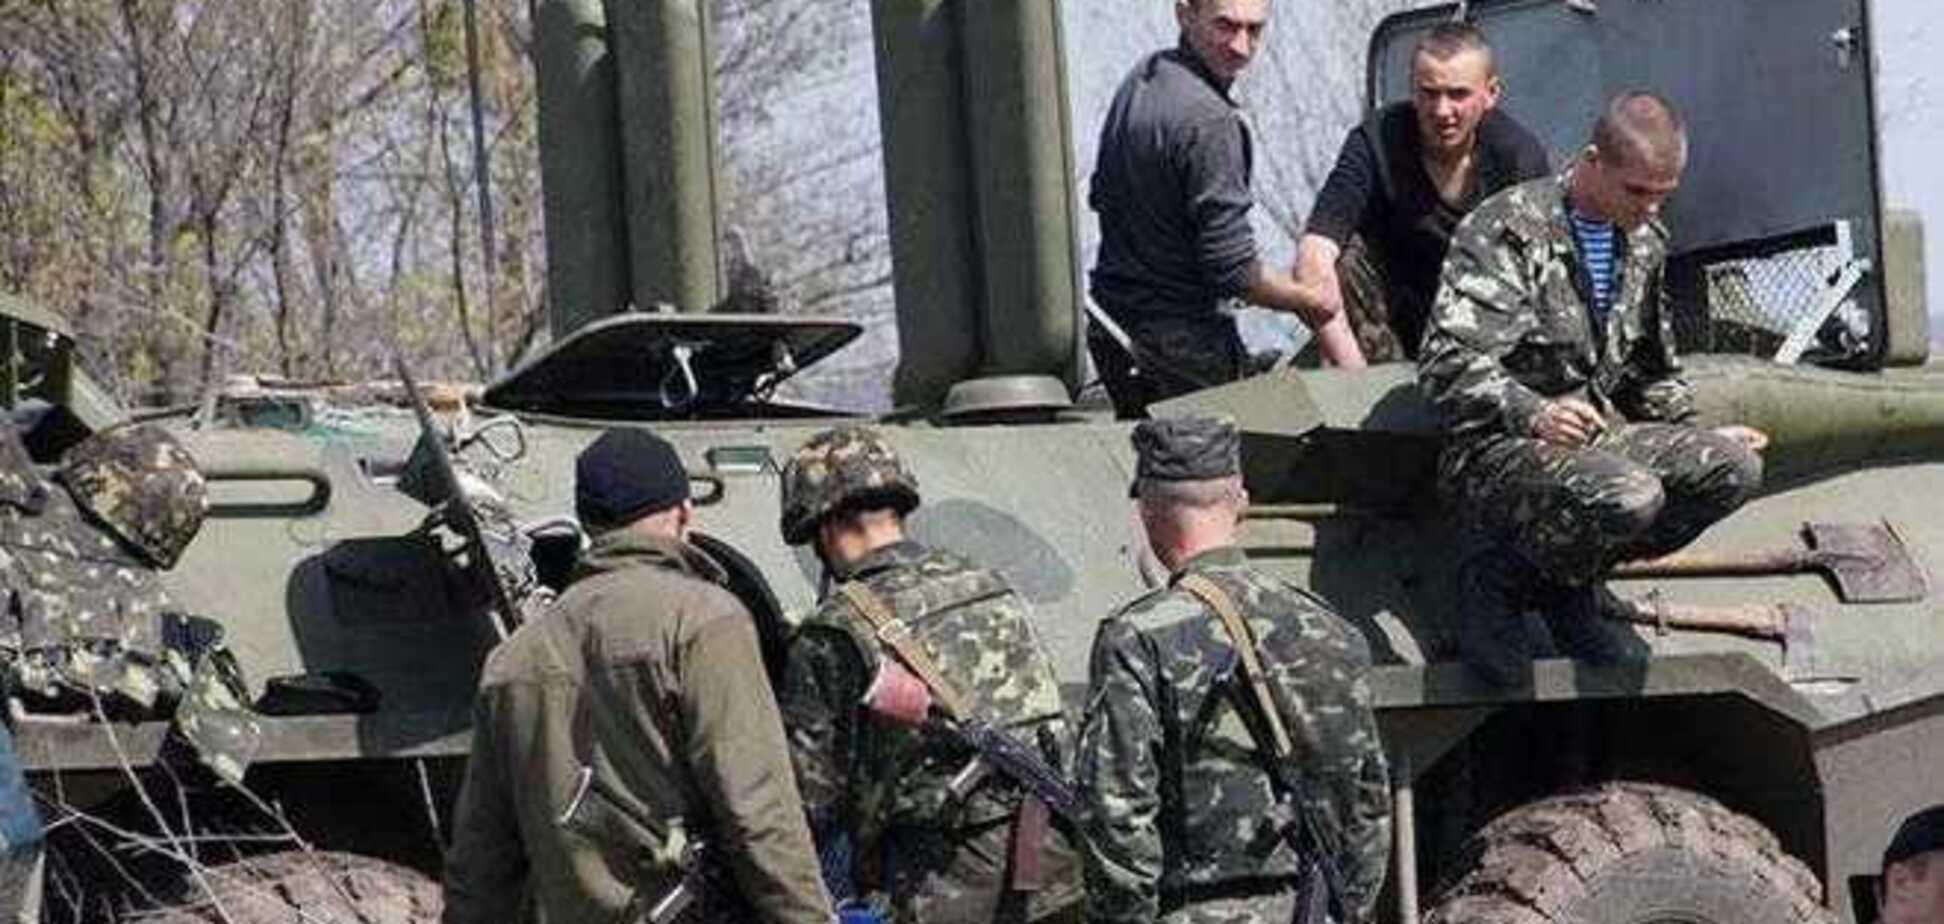 В Донецке десантники отбили у сепаратистов две БМД